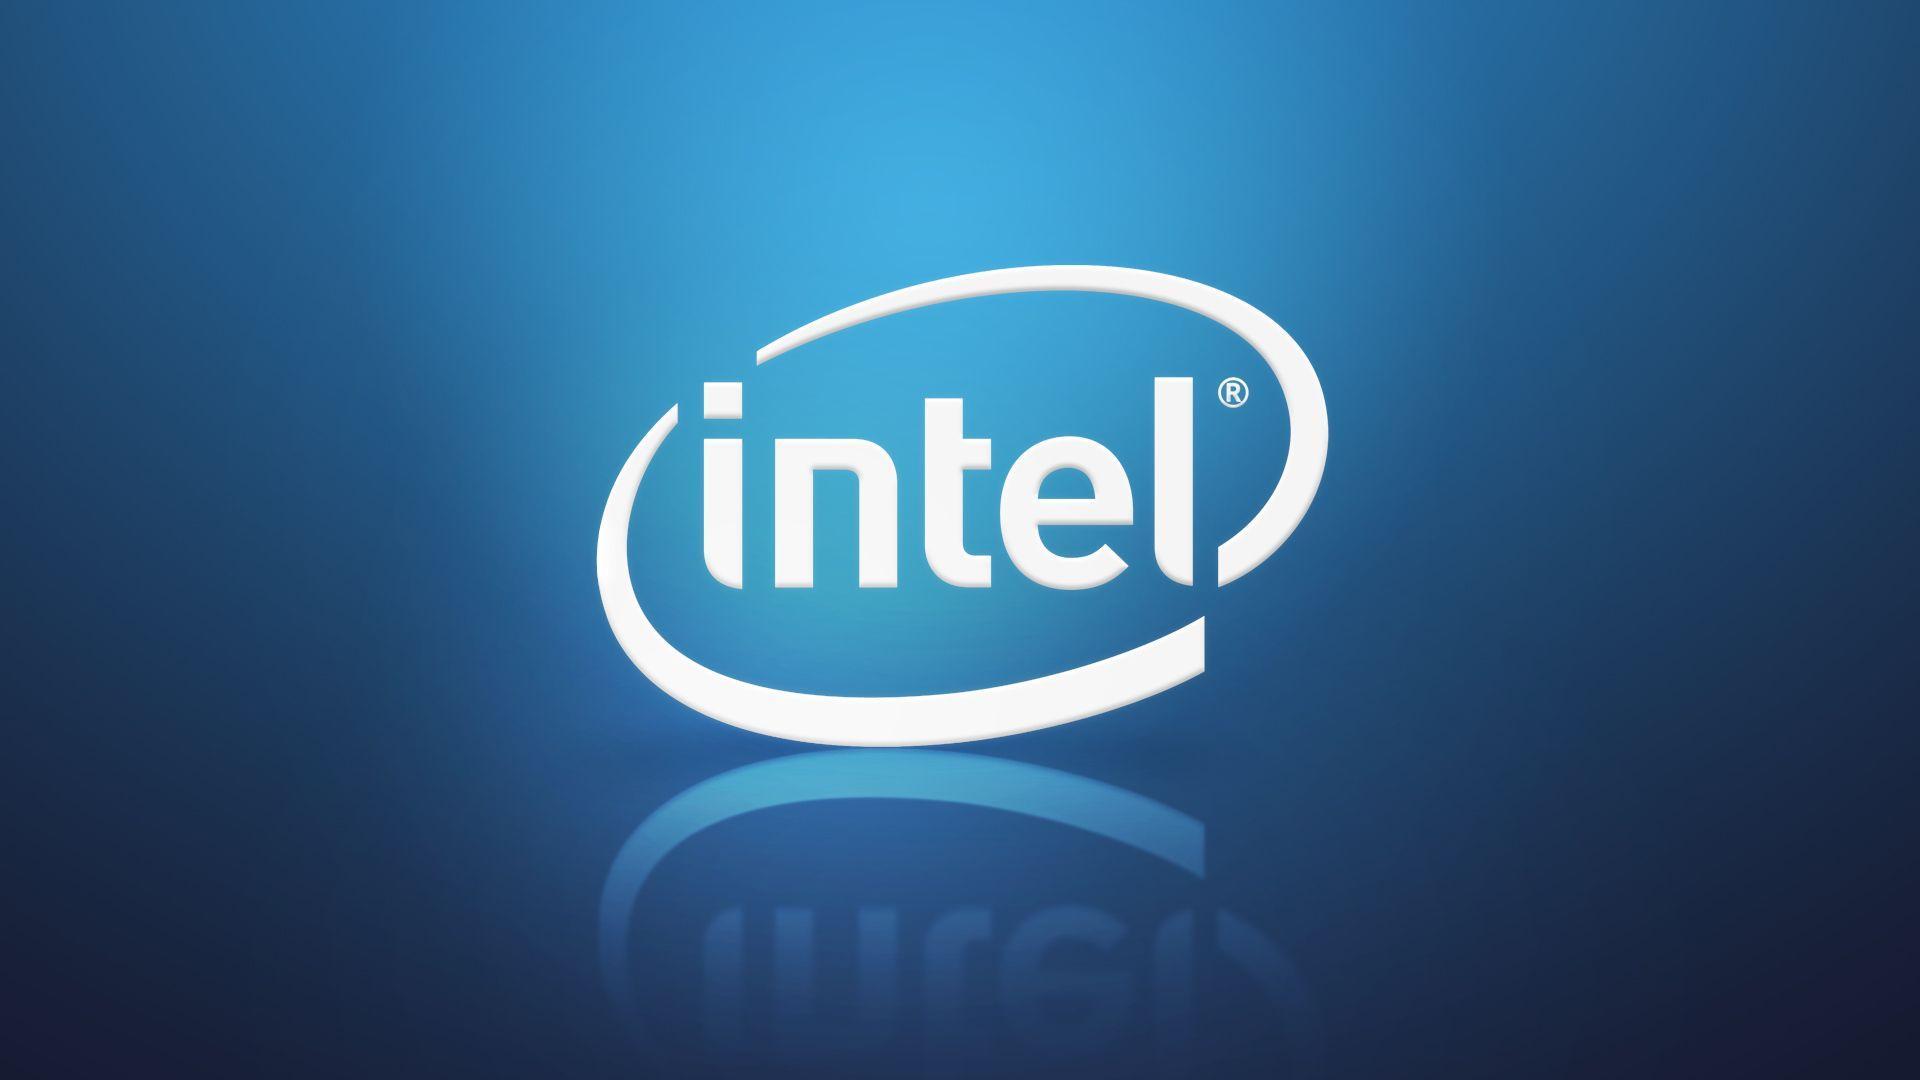 Best 47 Intel Pentium Wallpaper on HipWallpaper Business Intel 1920x1080